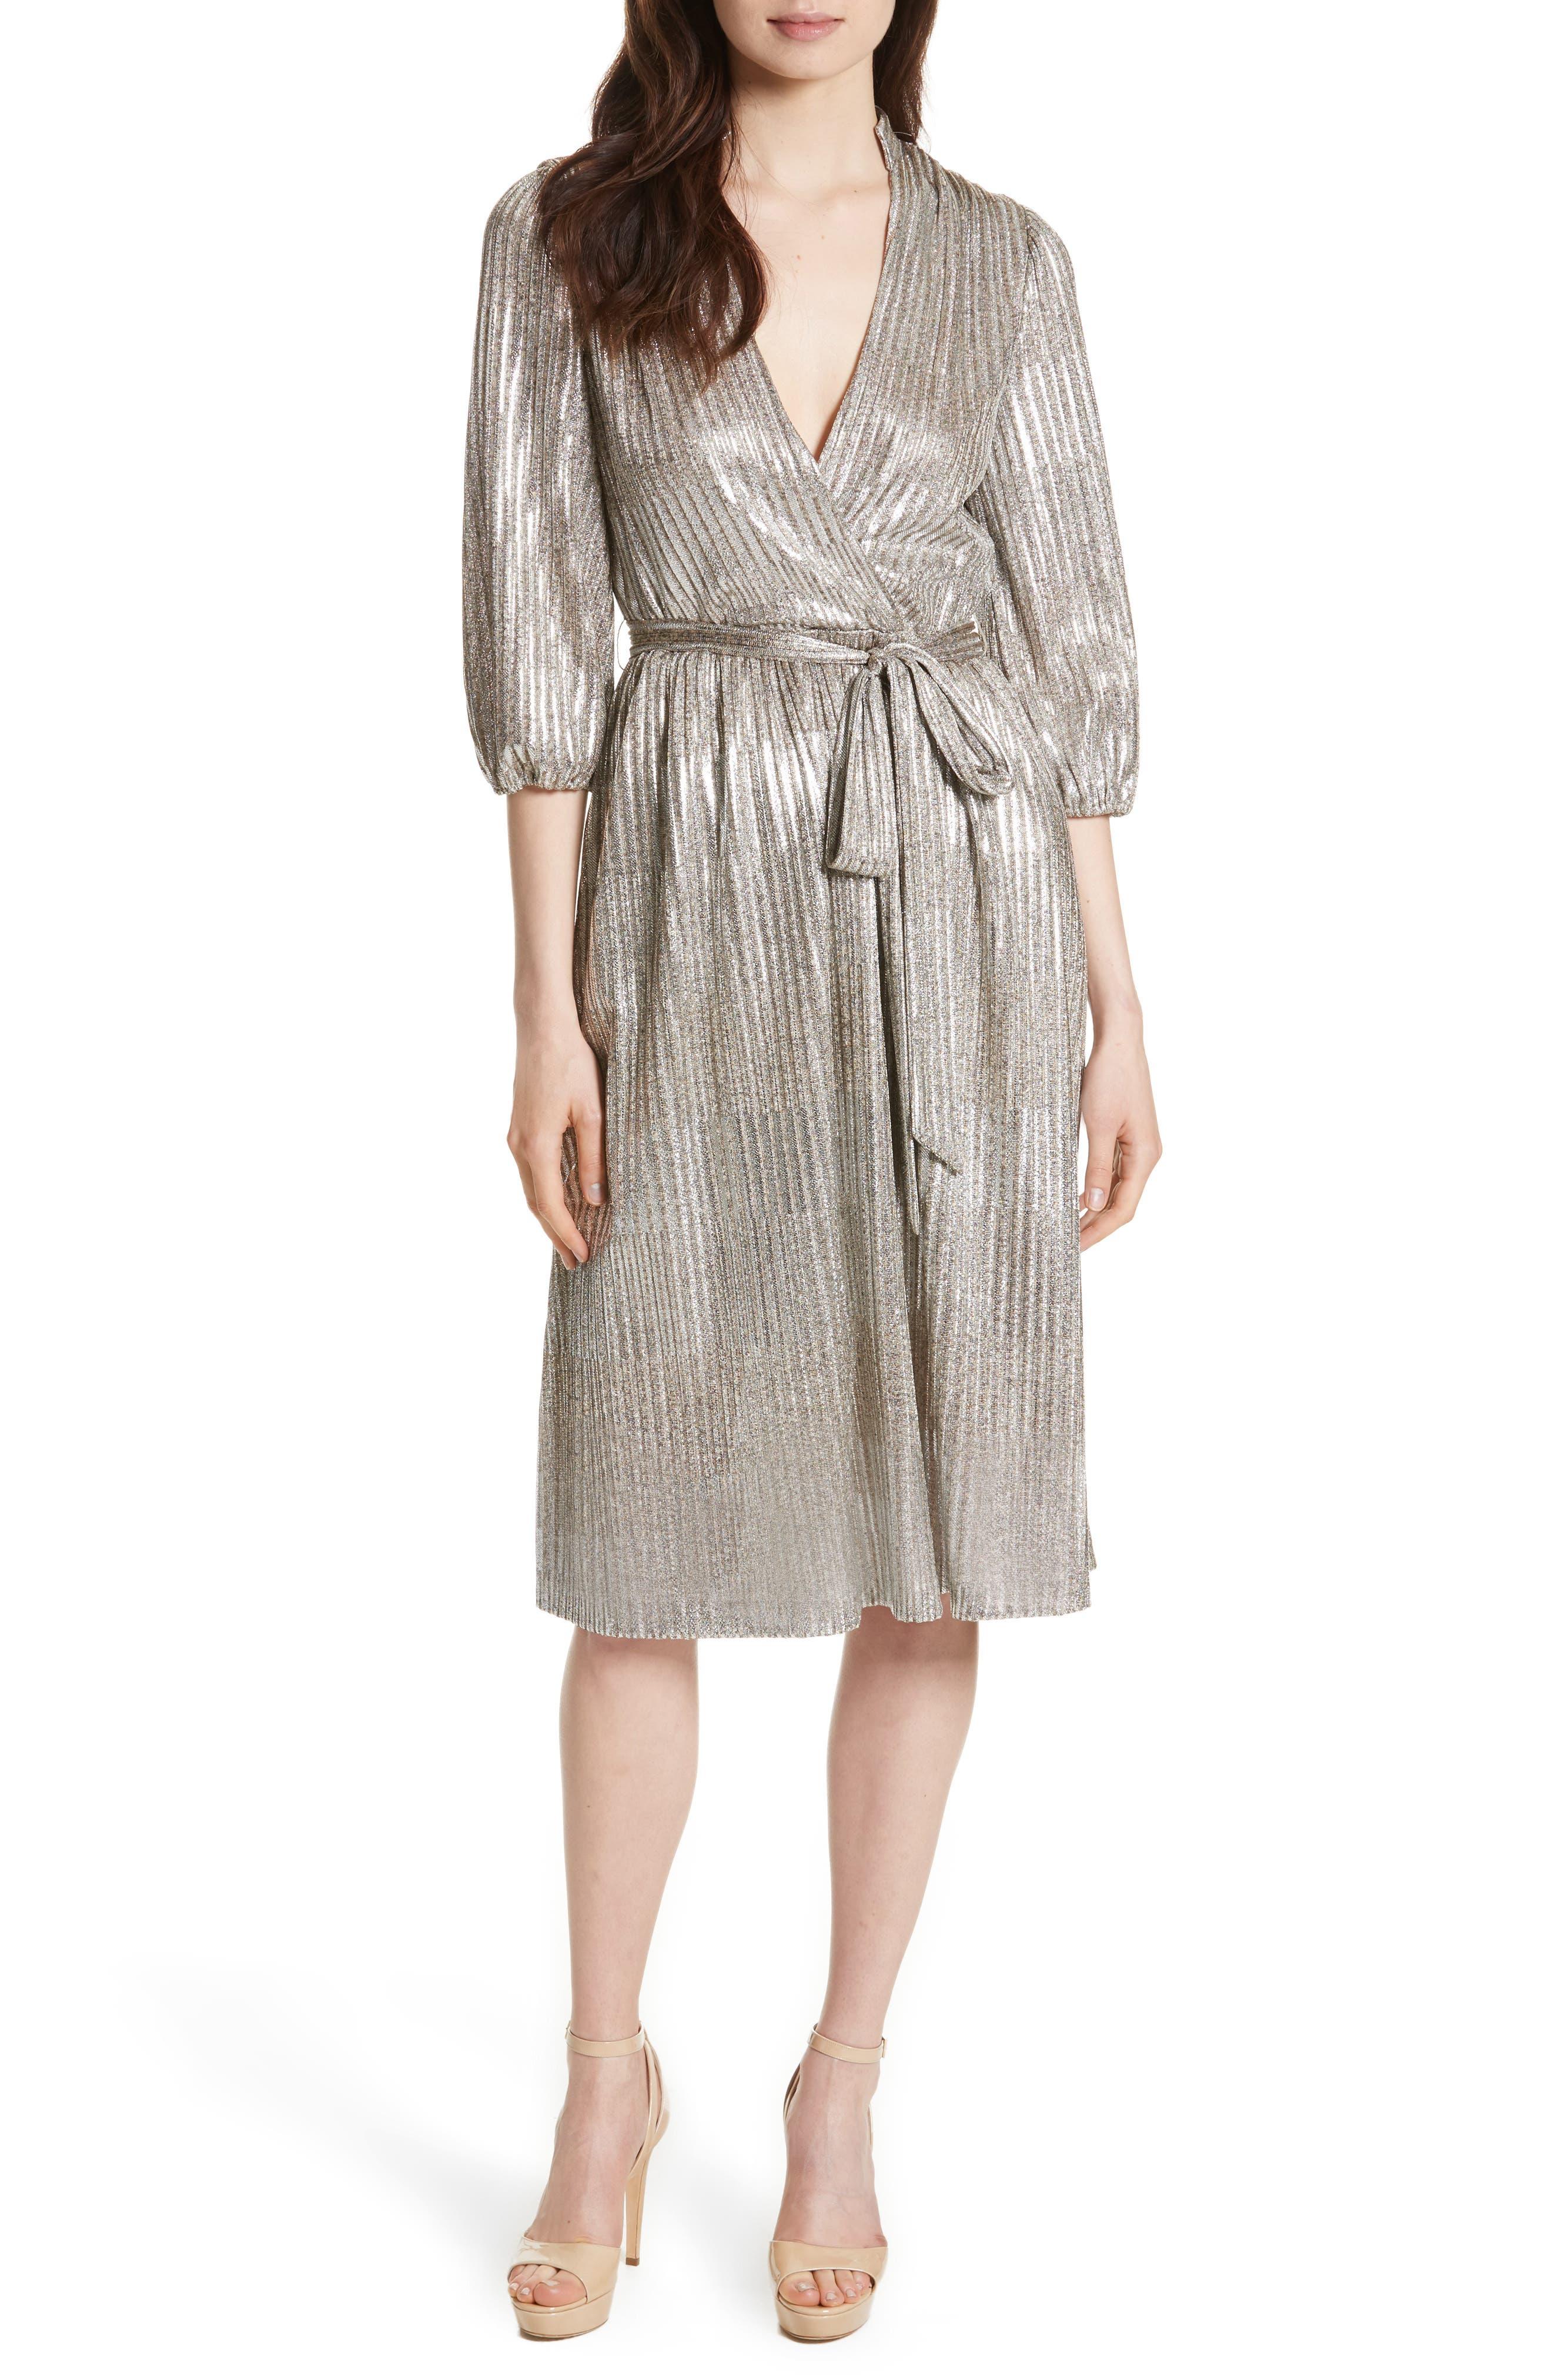 Alternate Image 1 Selected - Alice + Olivia Katina Metallic Wrap Dress